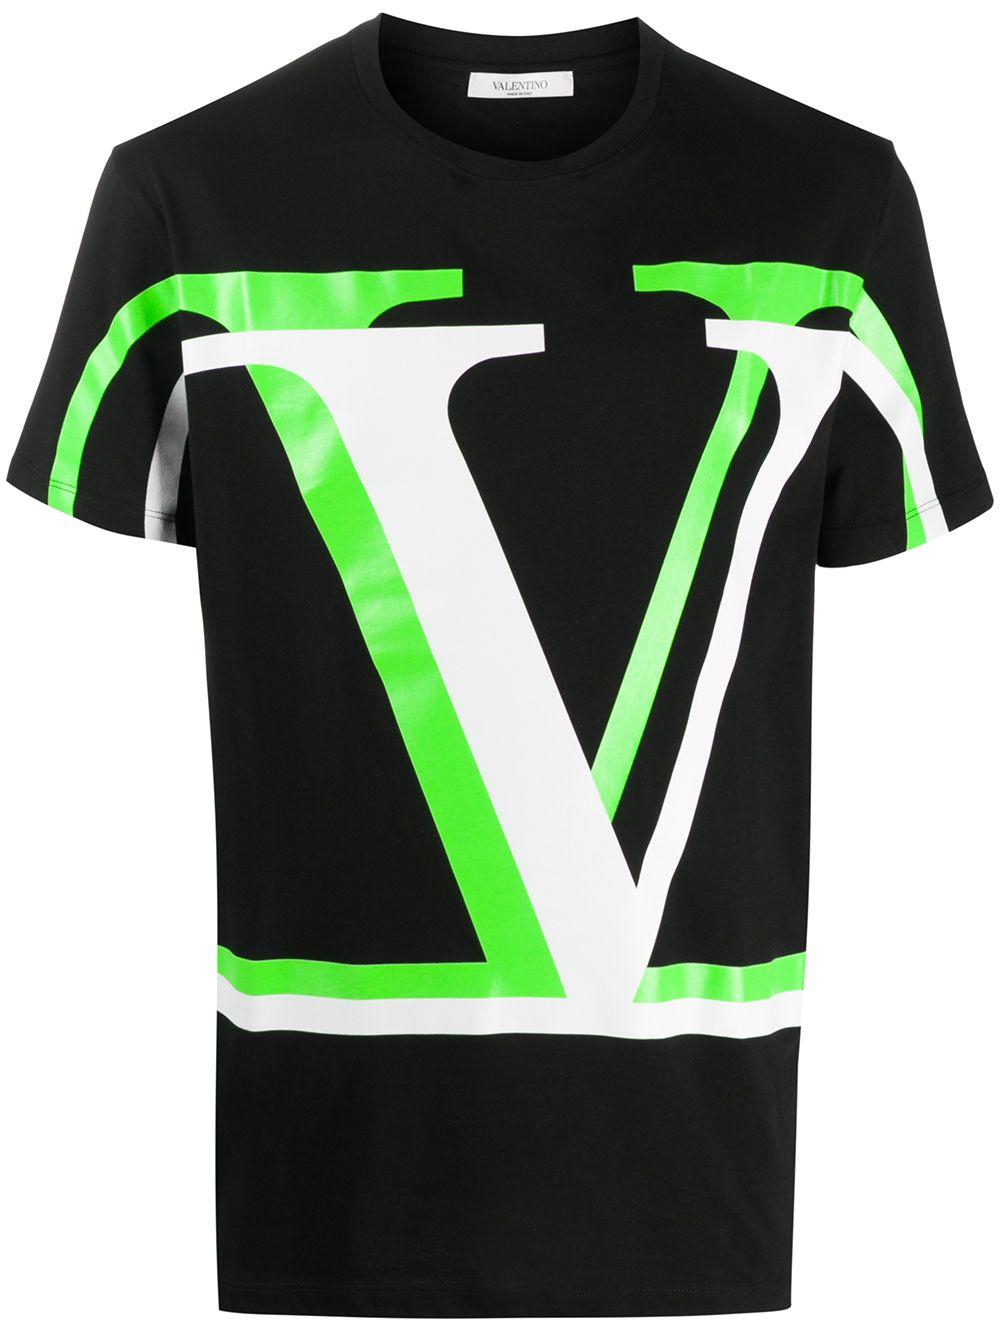 Vlogo Cotton T-shirt